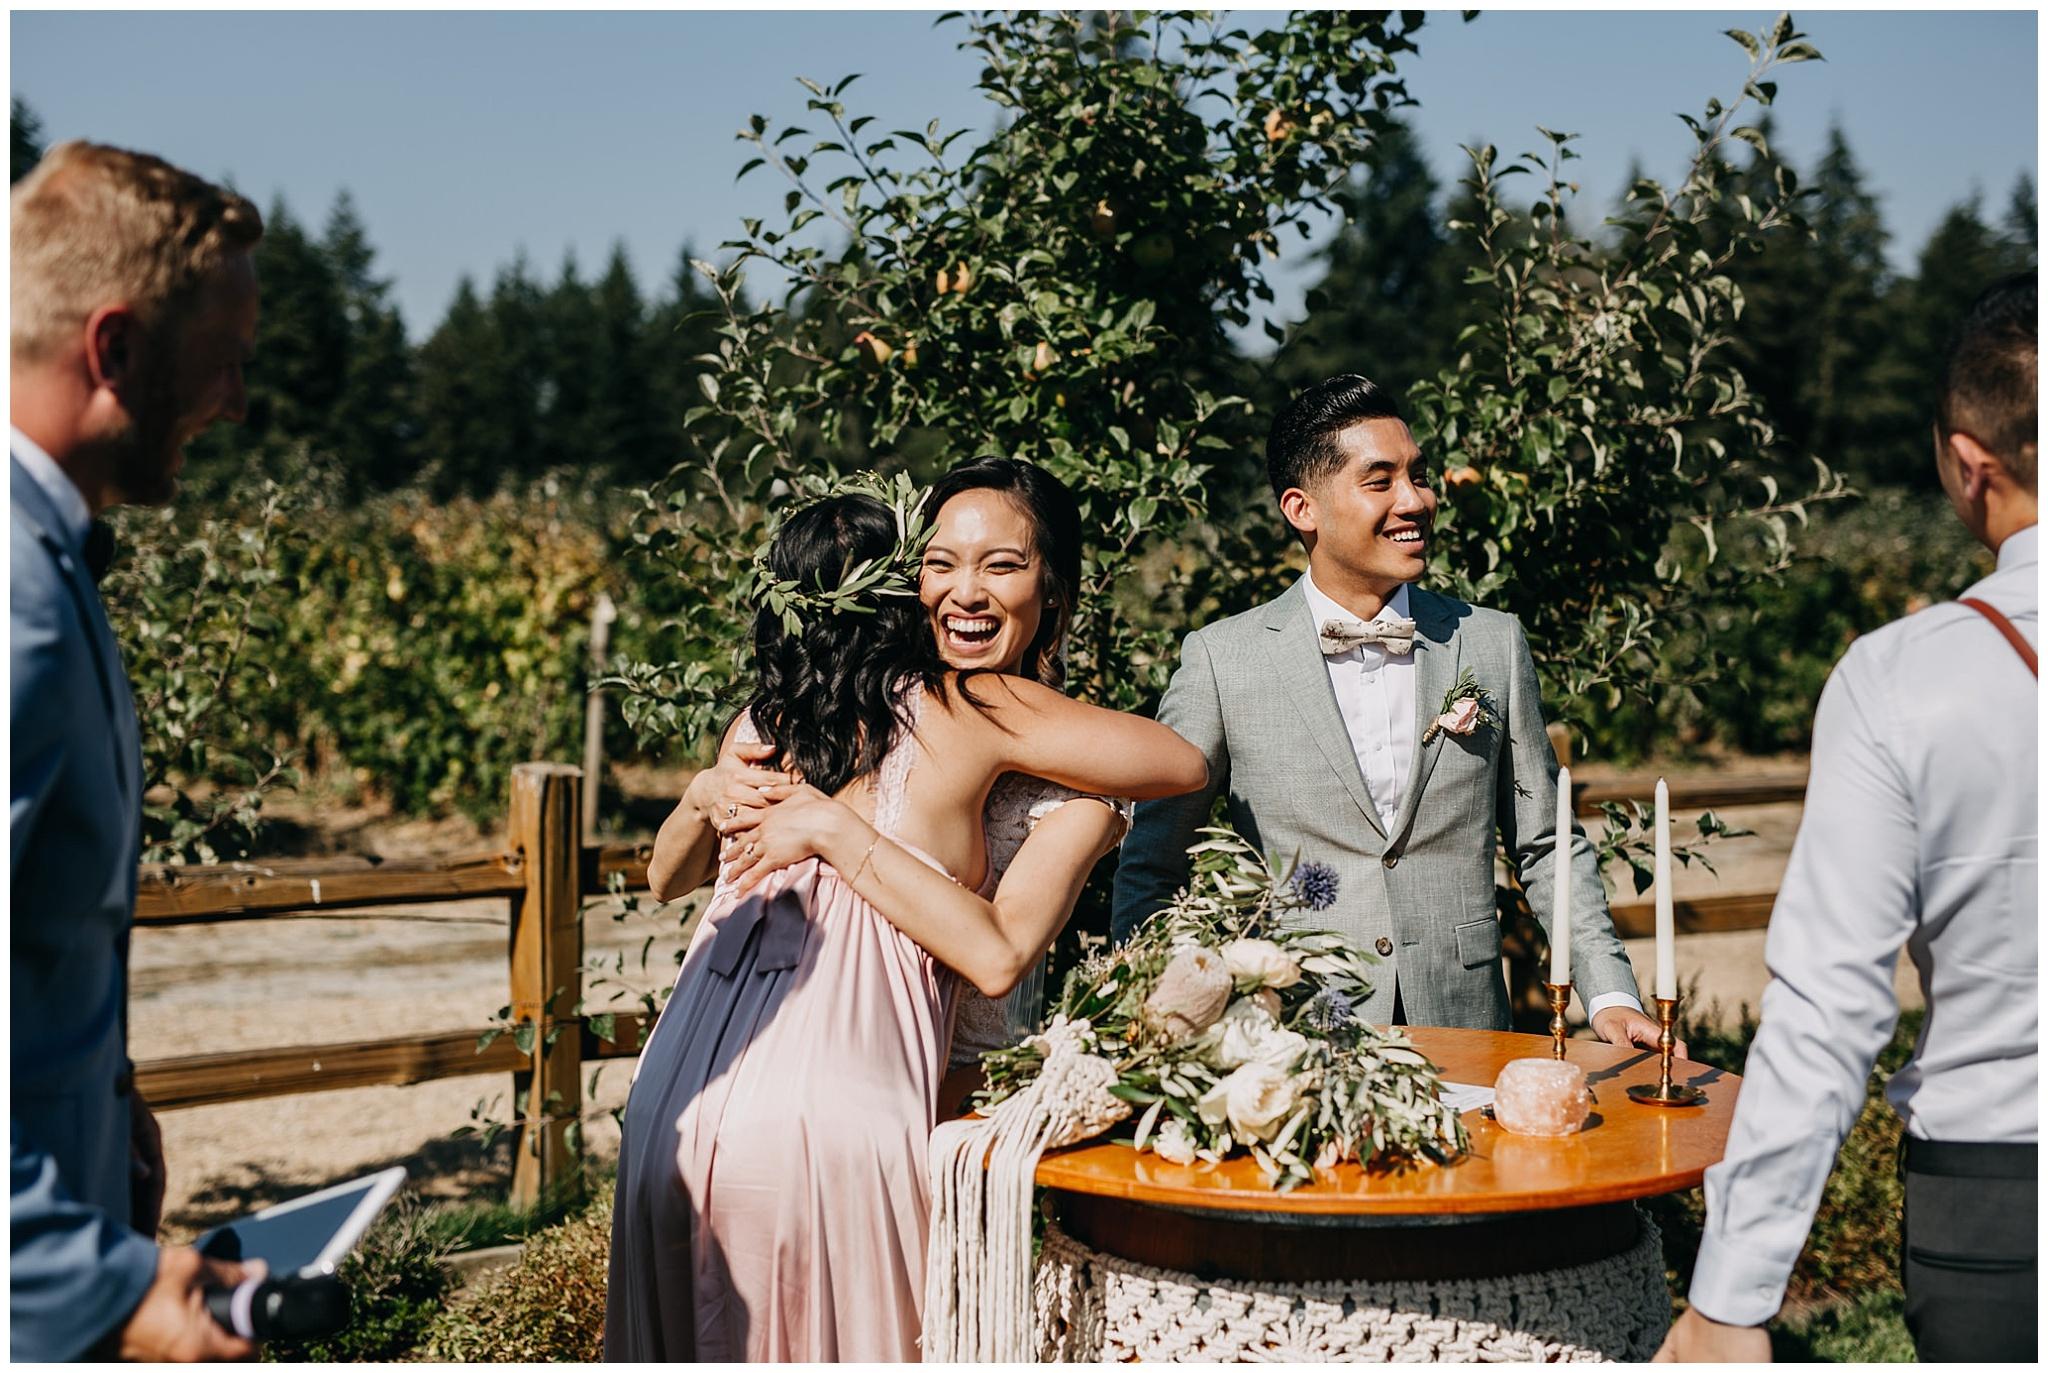 krause-berry-farms-langley-wedding_0069.jpg